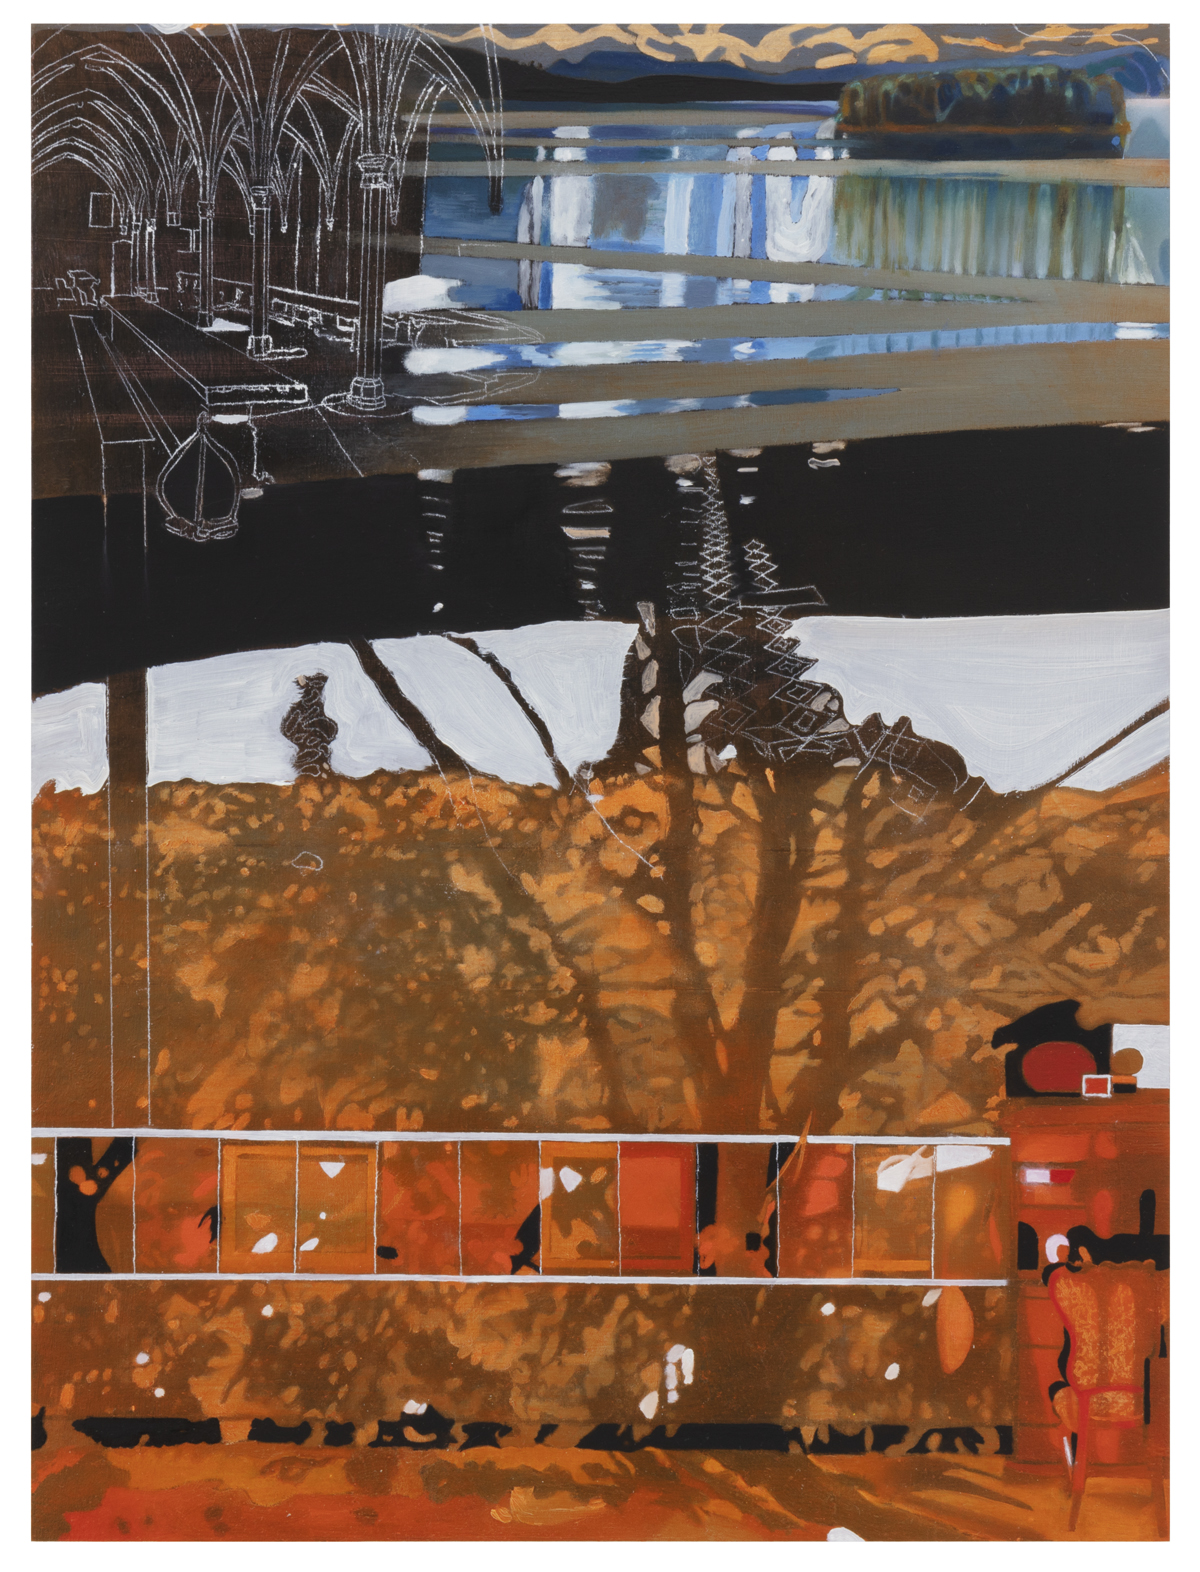 "Lisa D Manner,"" Wave washed"", 2020, oil on mdf, 40x30 cm, Galleri Flach"